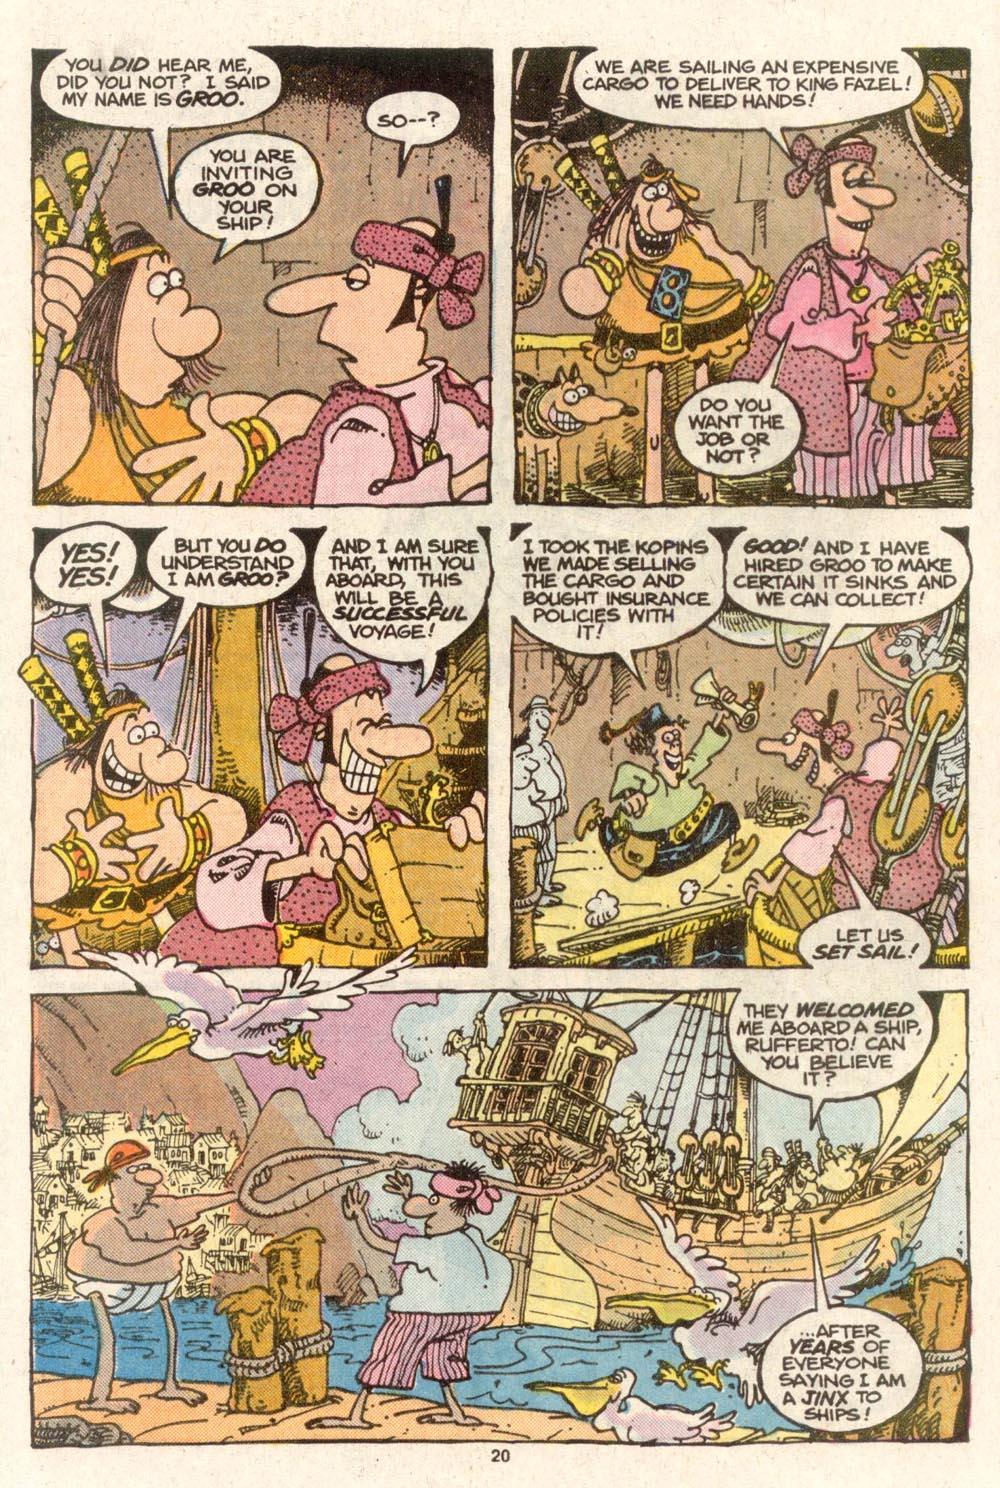 Read online Sergio Aragonés Groo the Wanderer comic -  Issue #48 - 21